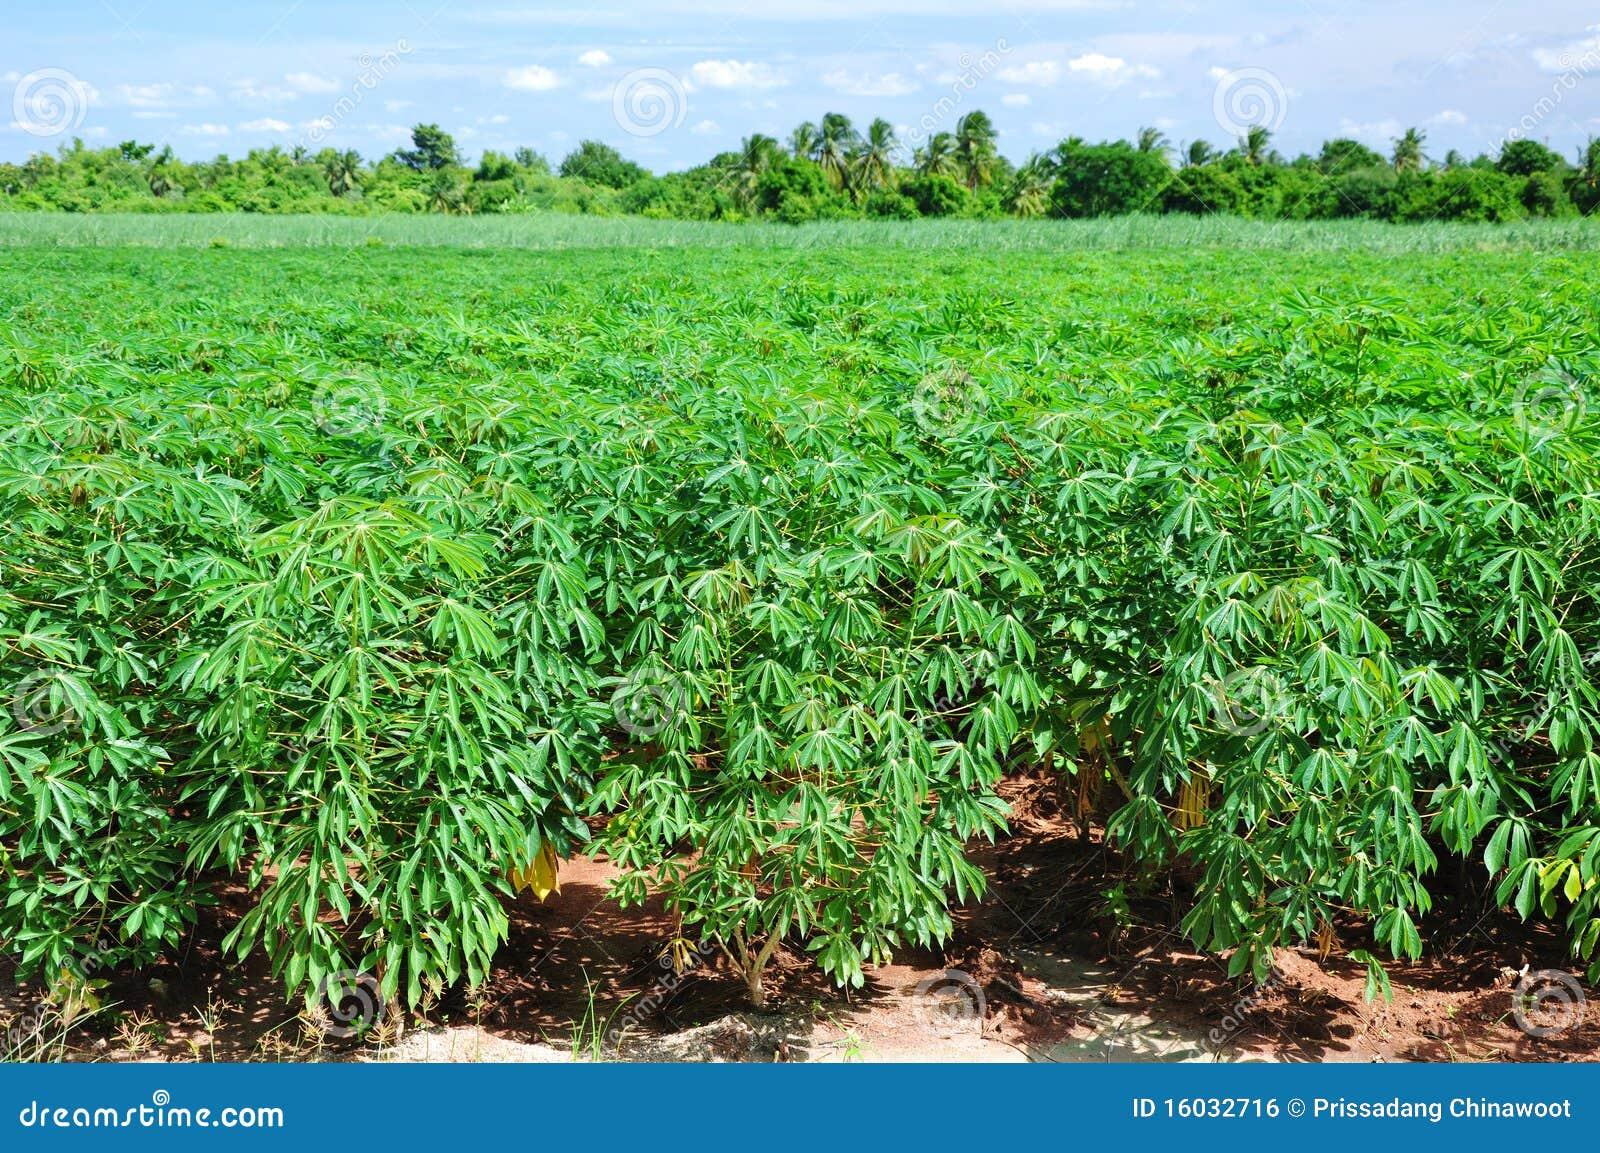 Cassava Plant Field. Royalty Free Stock Image - Image: 16032716